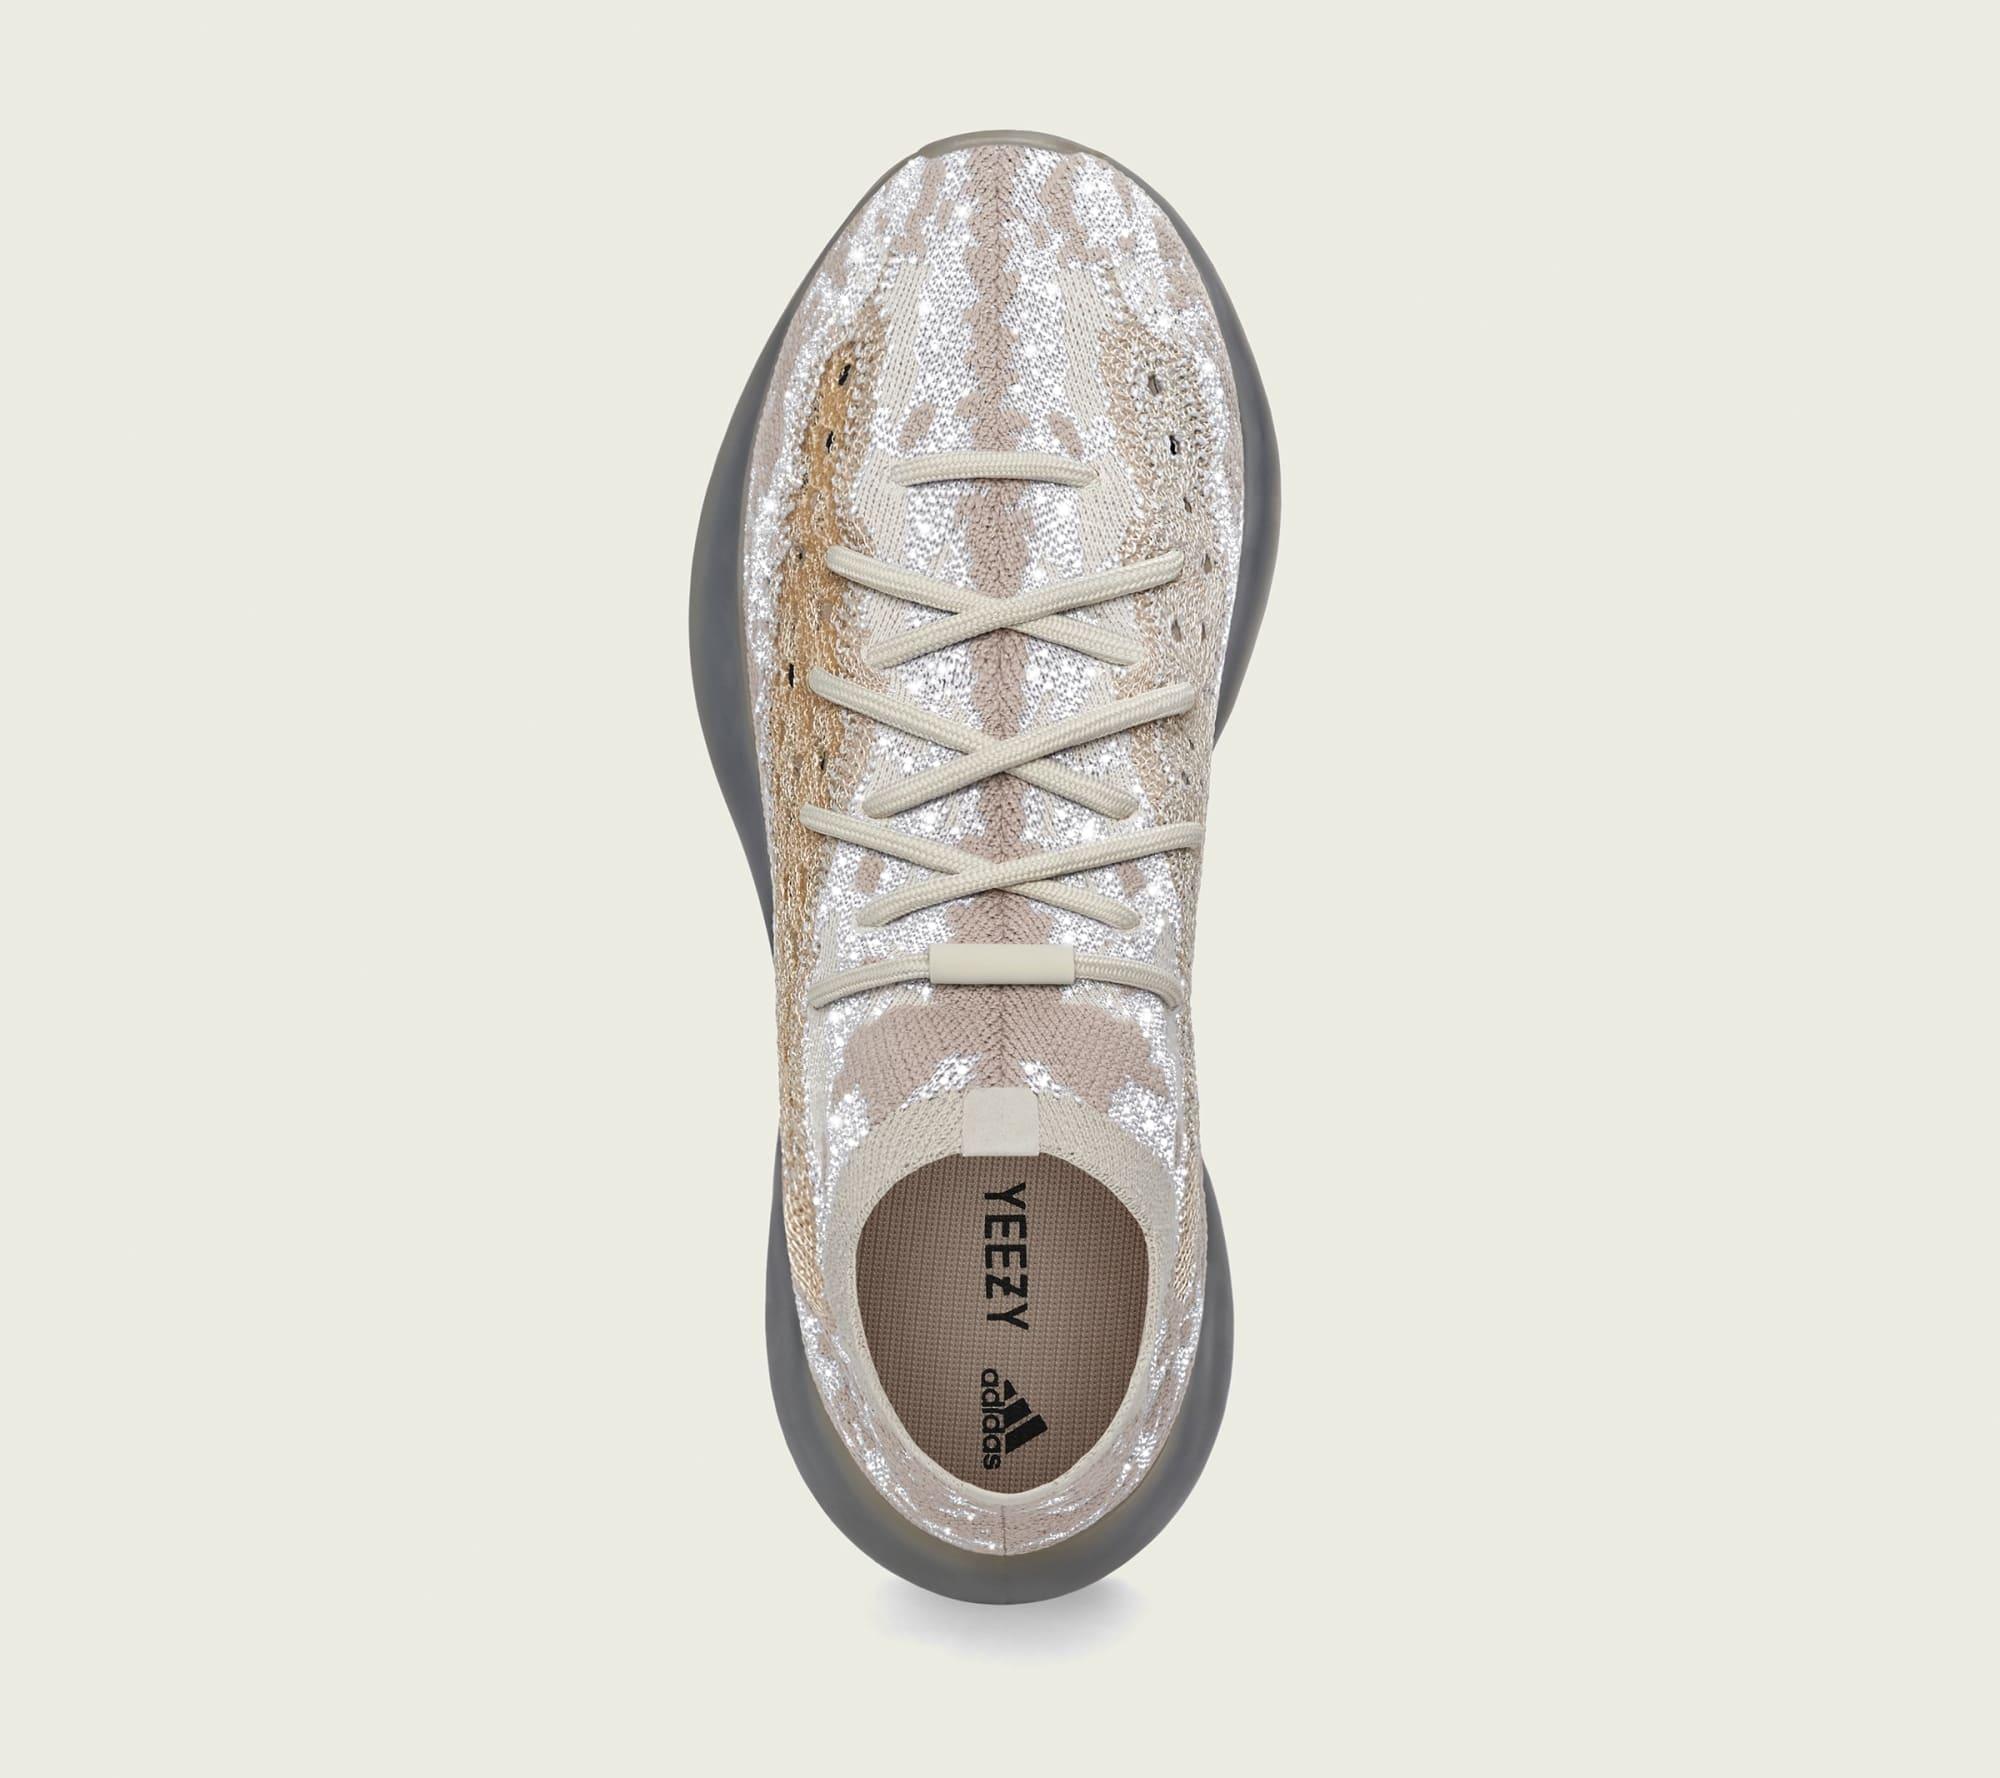 Adidas Yeezy Boost 380 'Pepper Reflective' FZ4977 Top